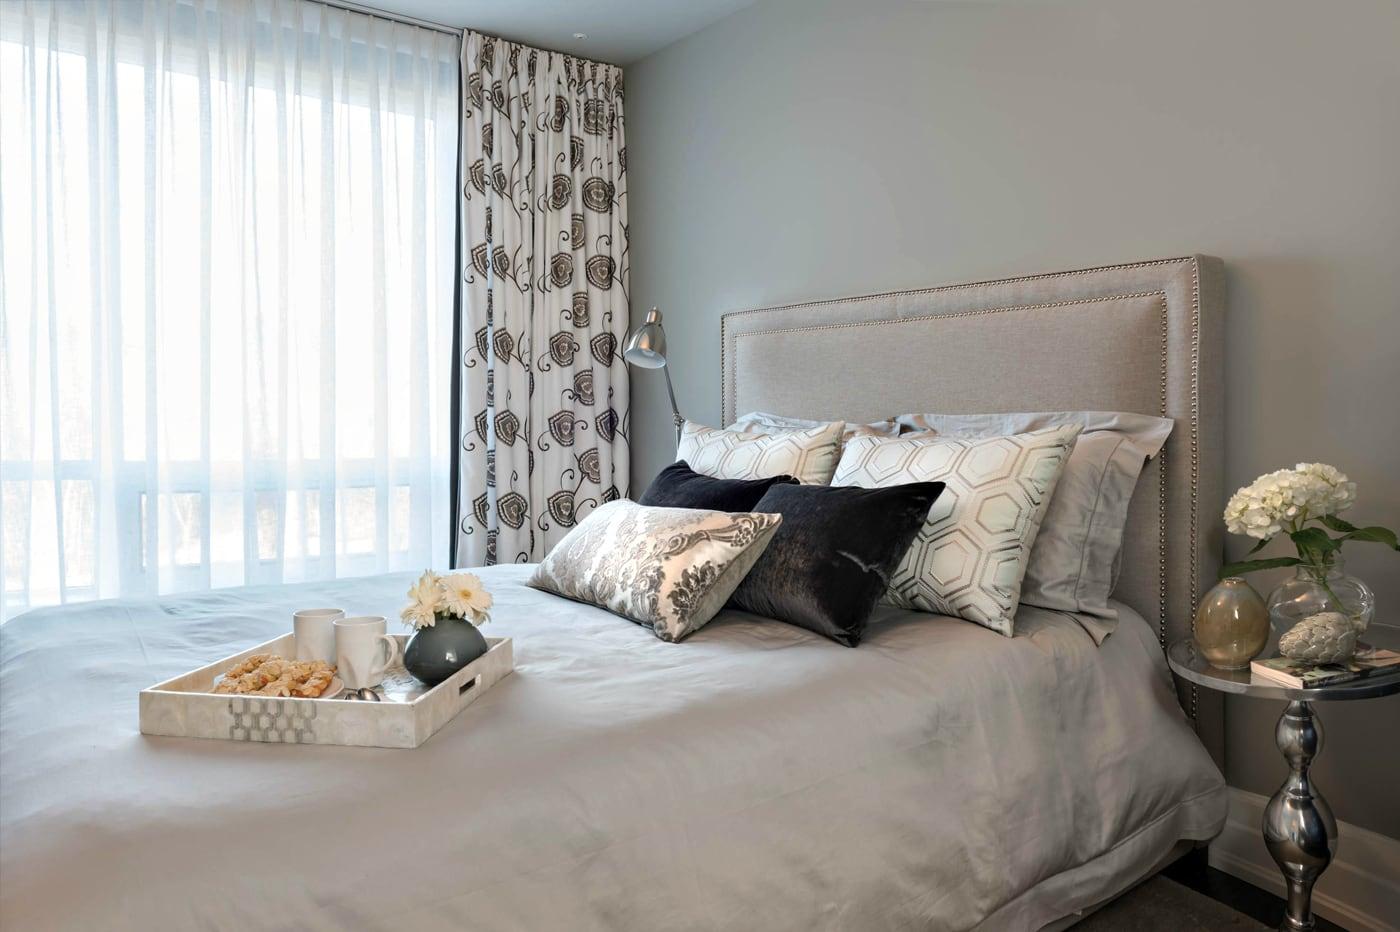 cozy bedroom, breakfast tray on bed